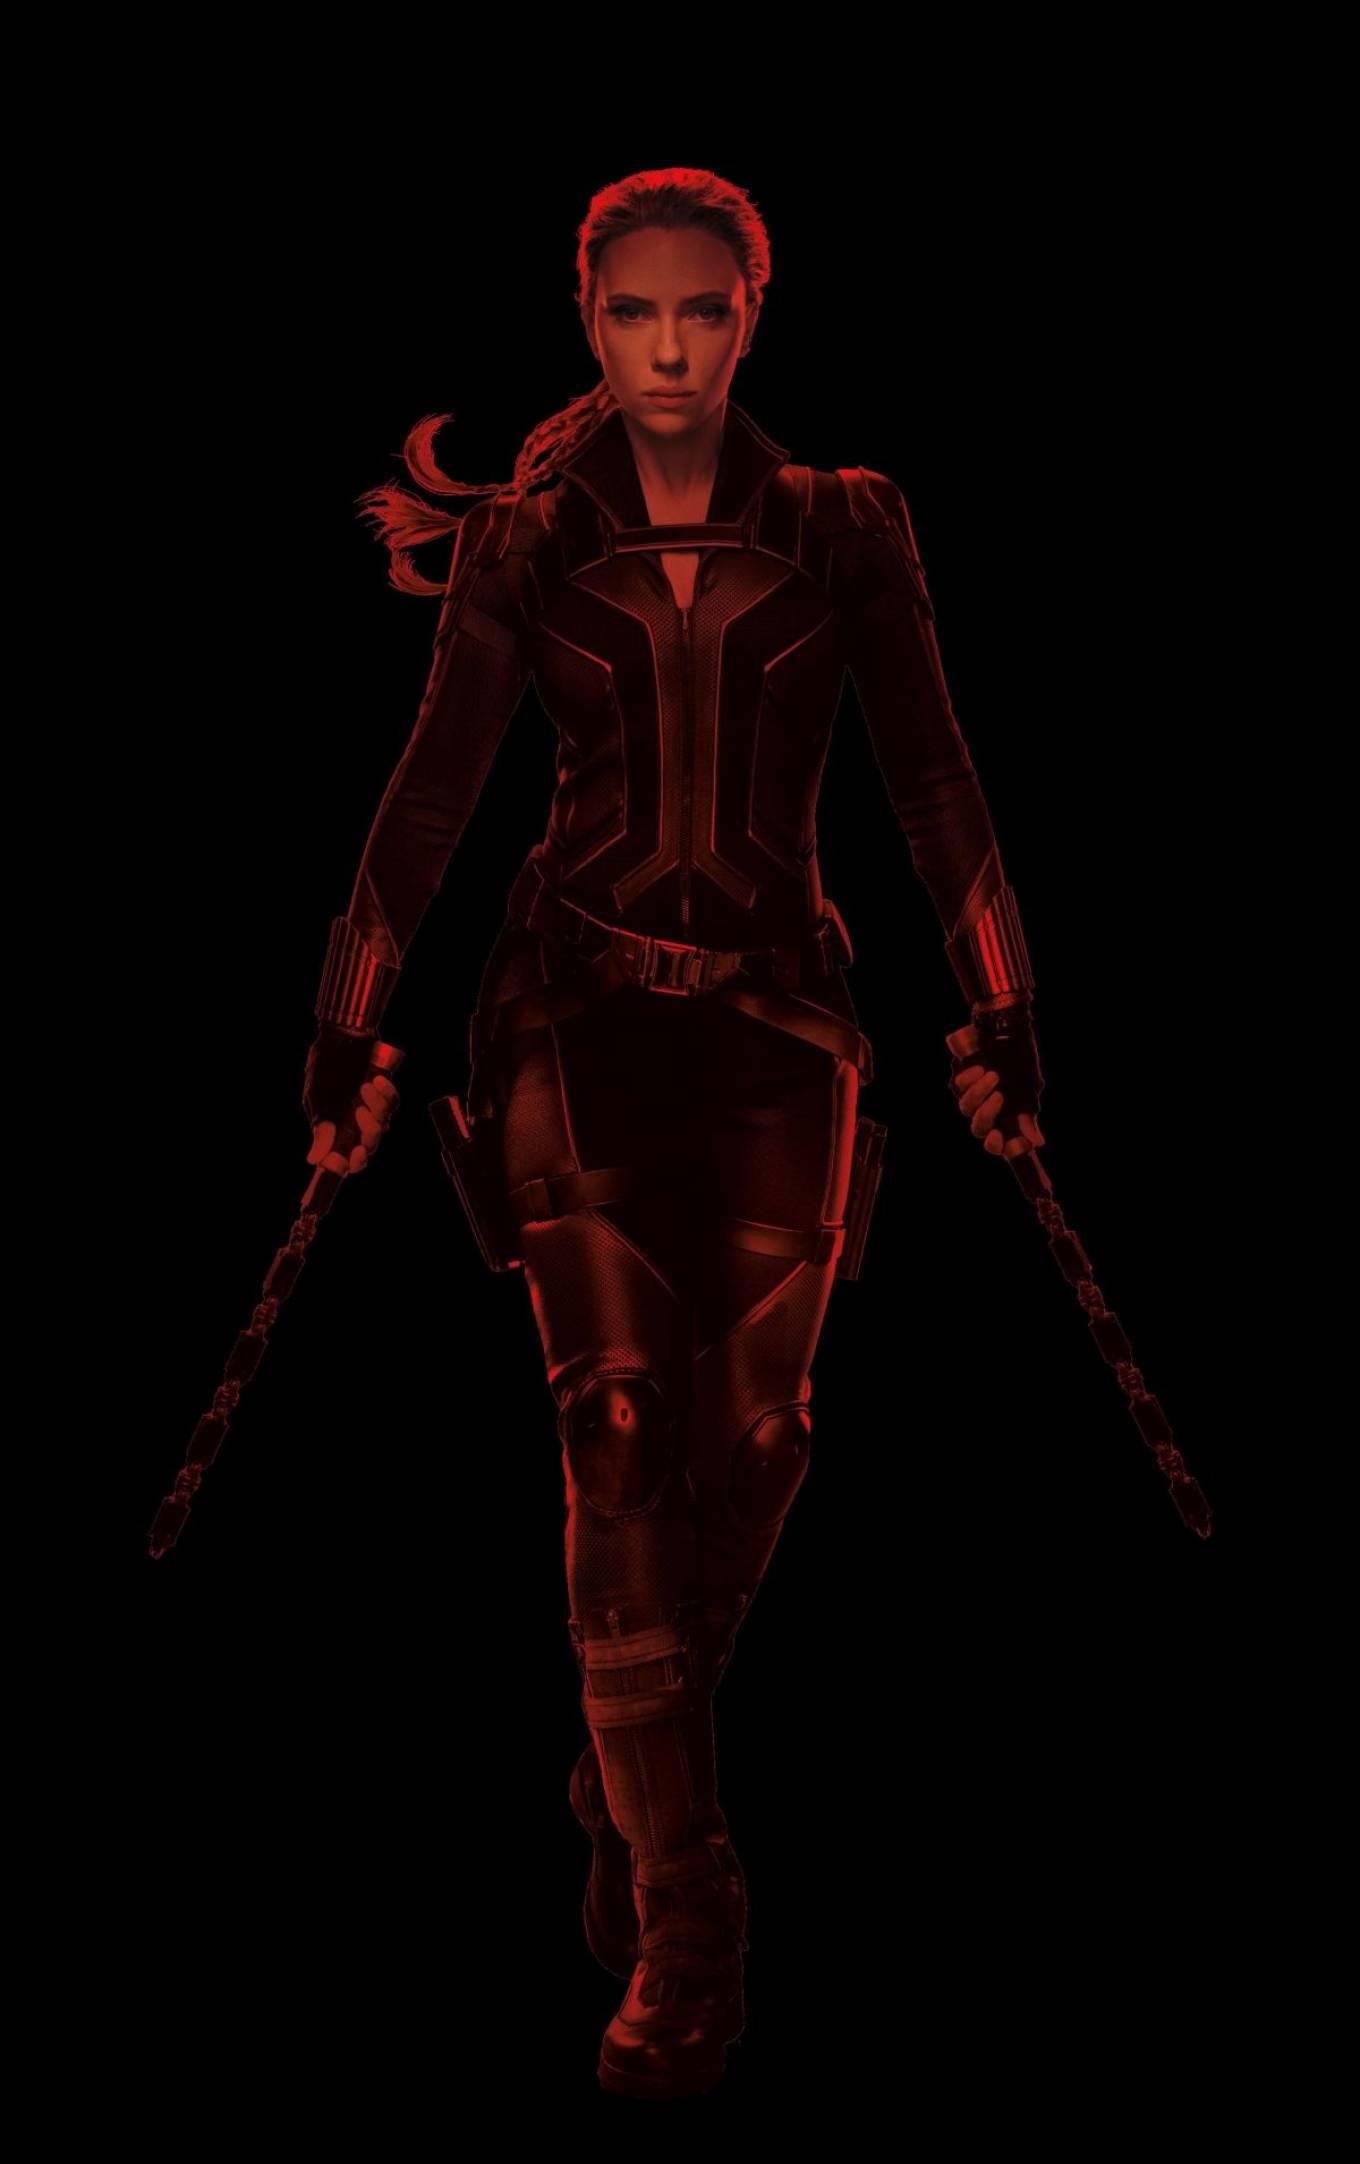 Scarlett Johansson 2020 : Scarlett Johansson – Black Widow 2021 Promos-03